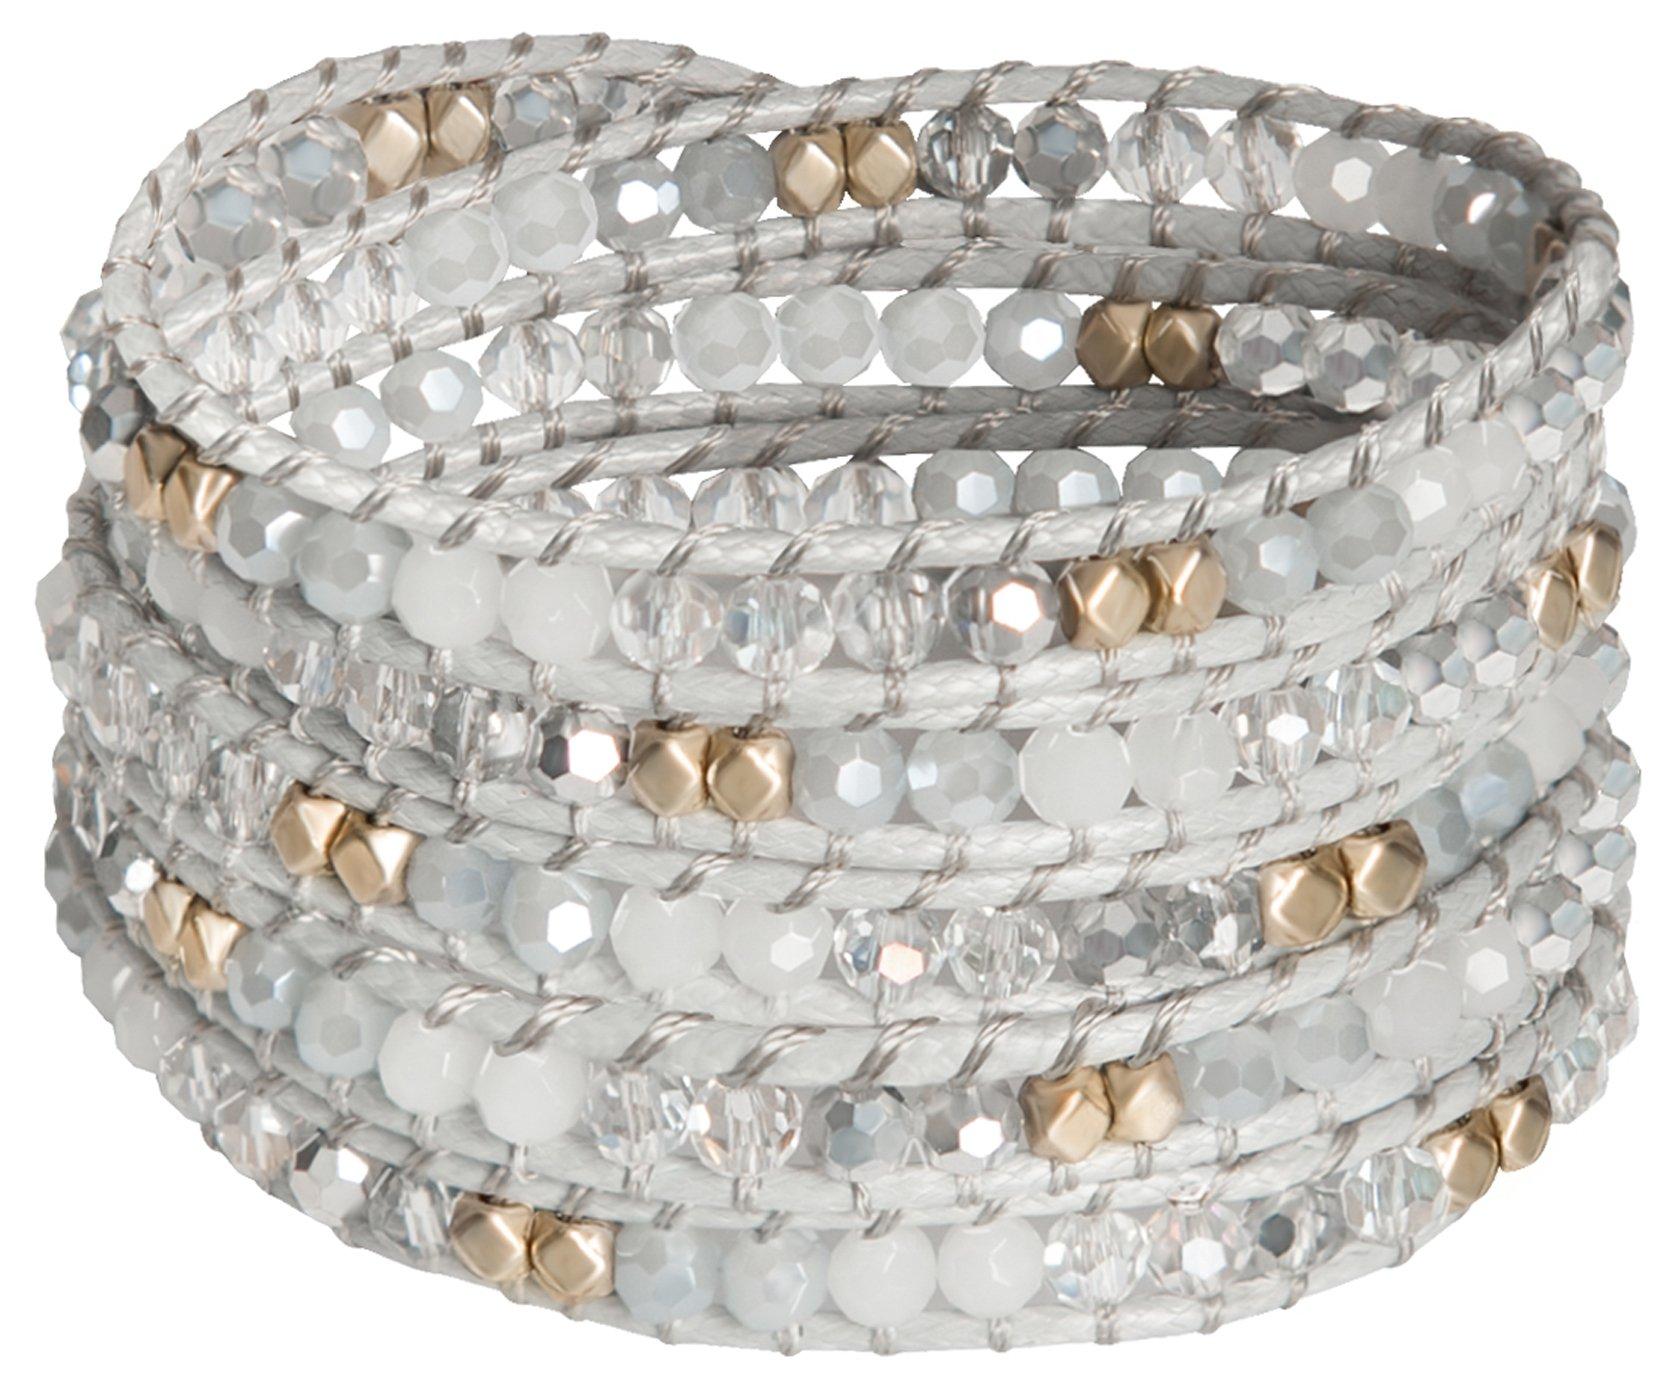 Sun Life Style 5 Wrap Bracelet - Bangle Cuff Rope With Beads - Unisex - Free Size Adjustable (silver)